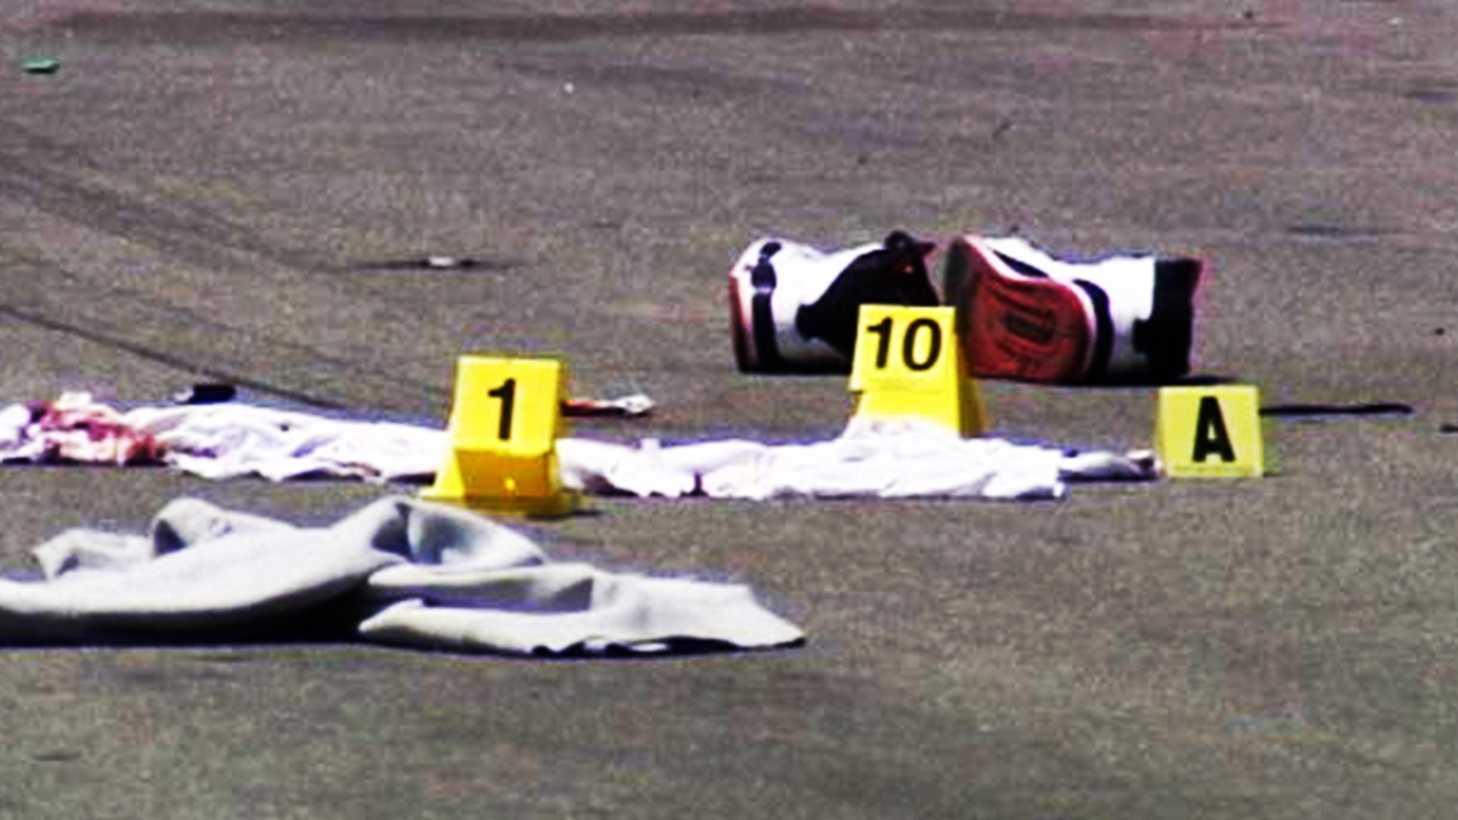 Daniel Castillo was slain here on North Sanborn Roadin Salinas. (June 8, 2014)